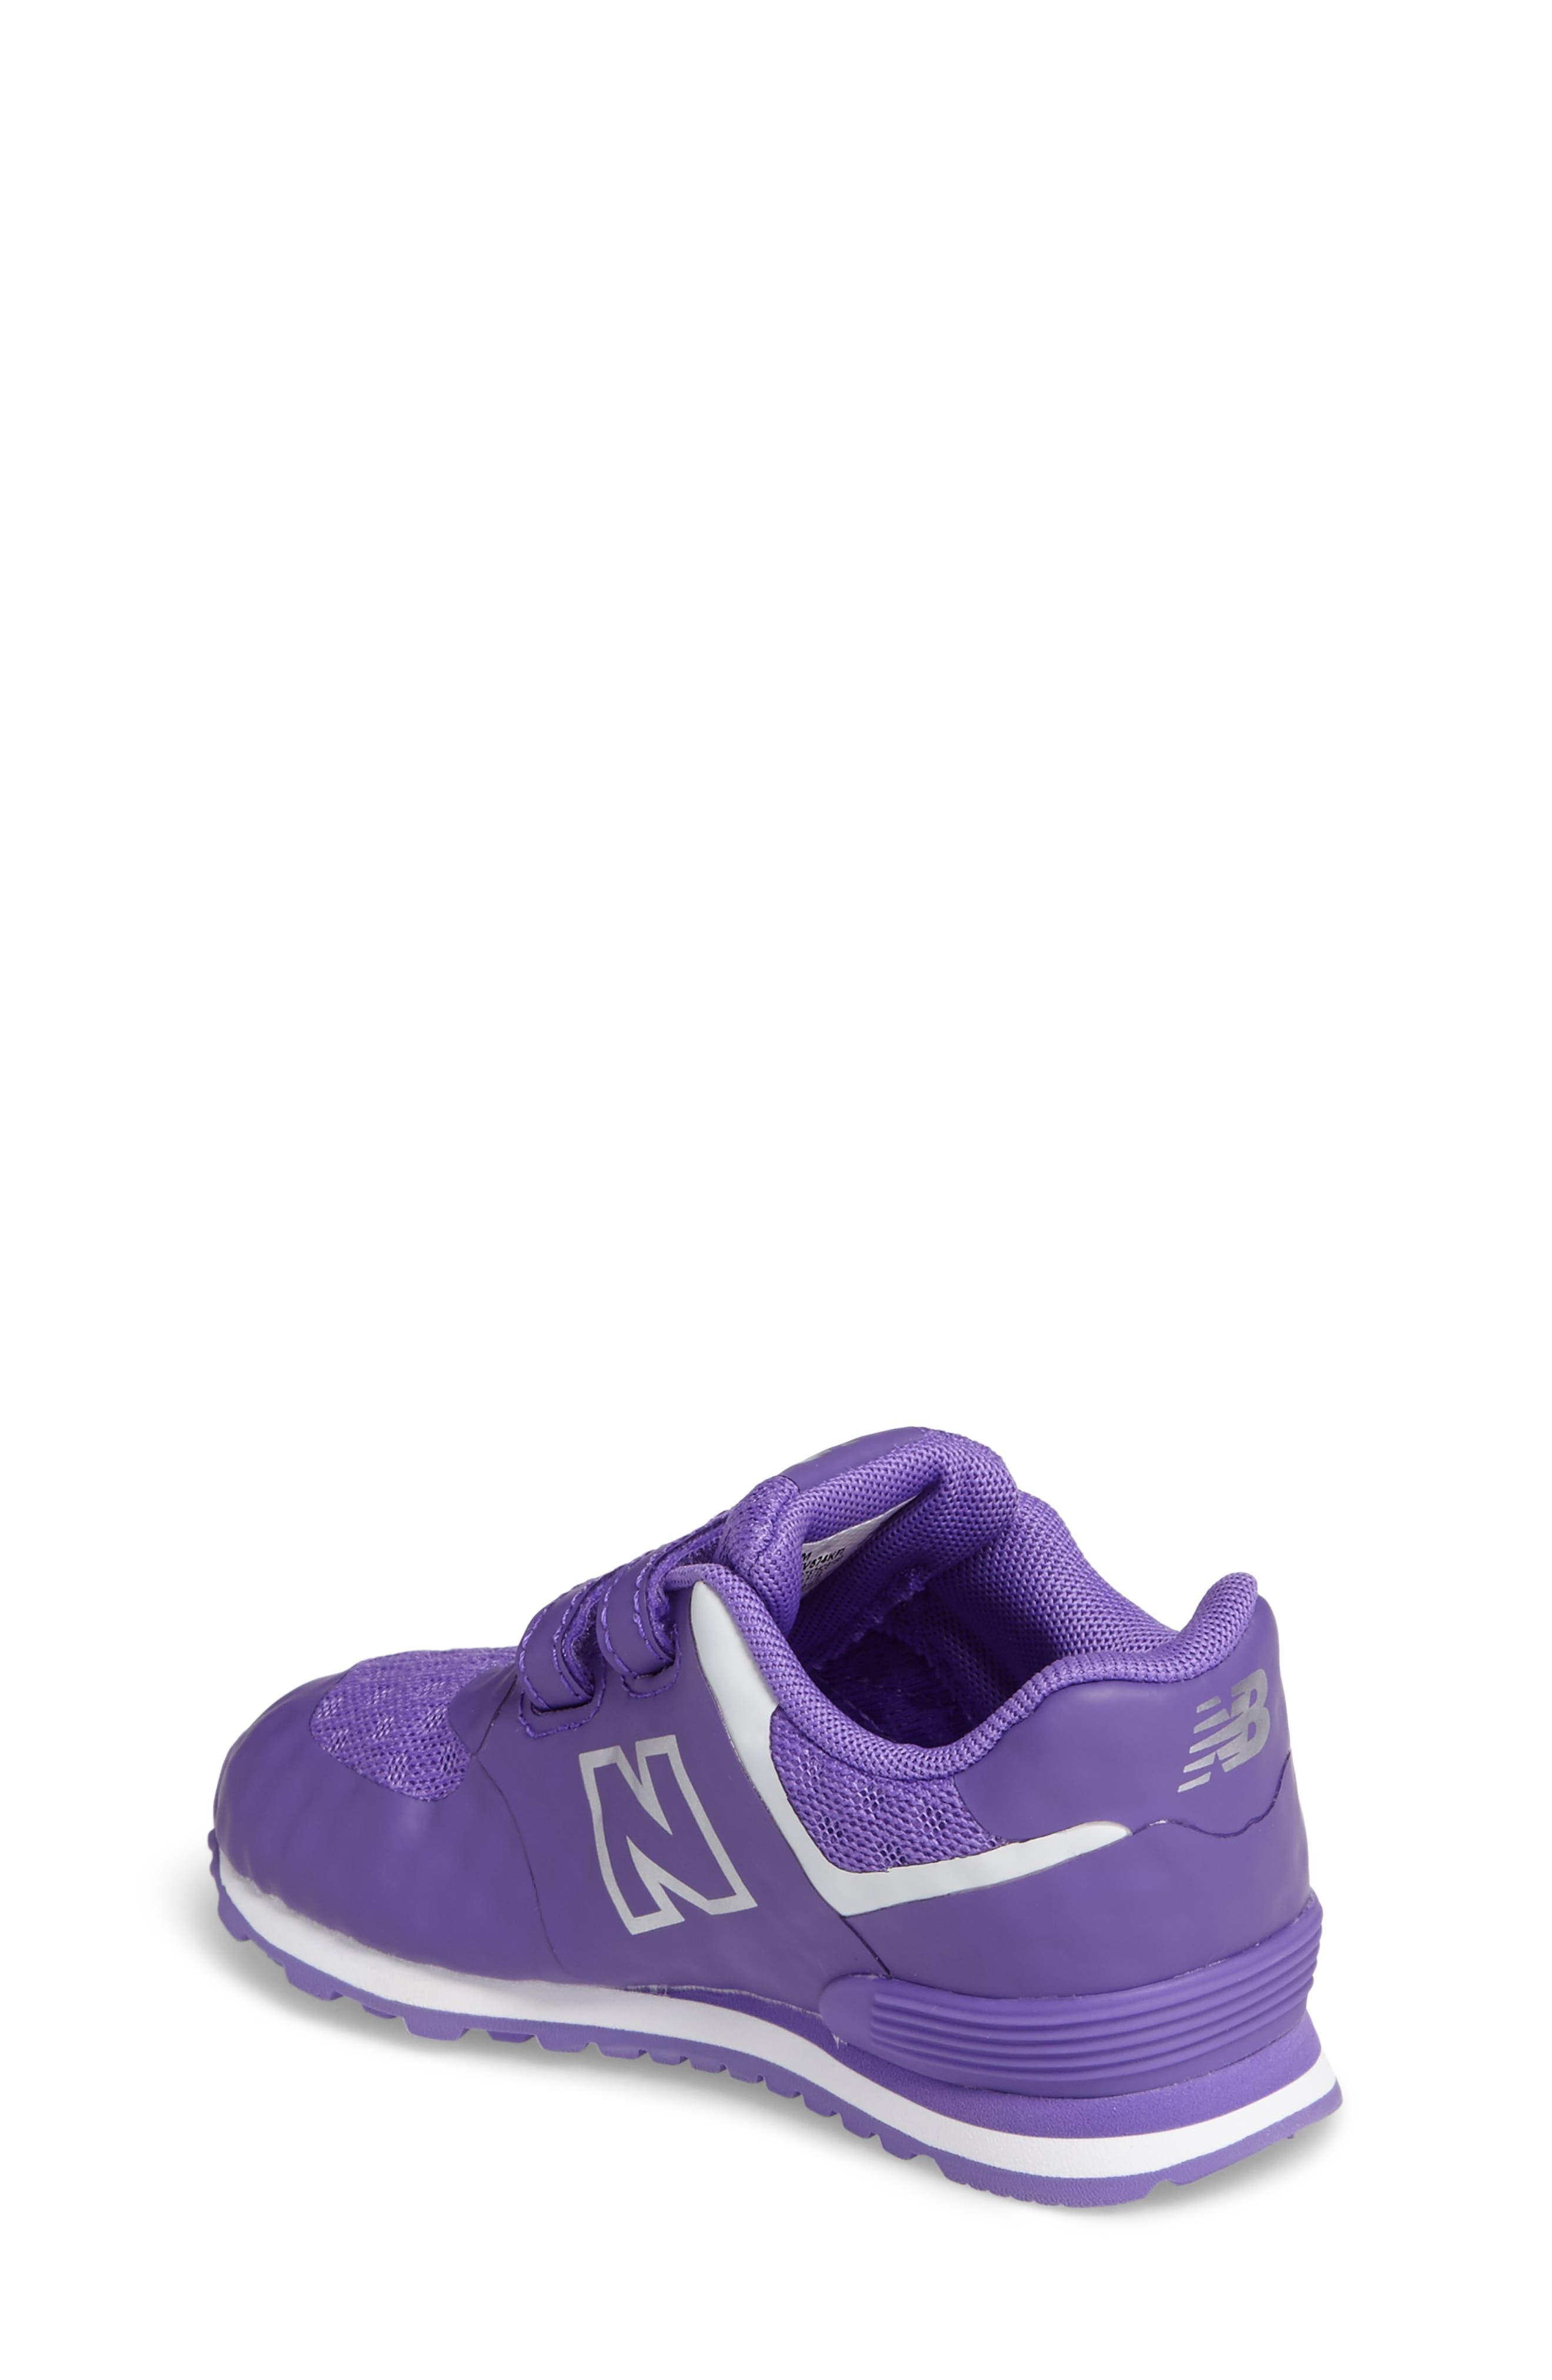 Alternate Image 2  - New Balance 574 Sneaker (Baby, Walker, Toddler, Little Kid & Big Kid)